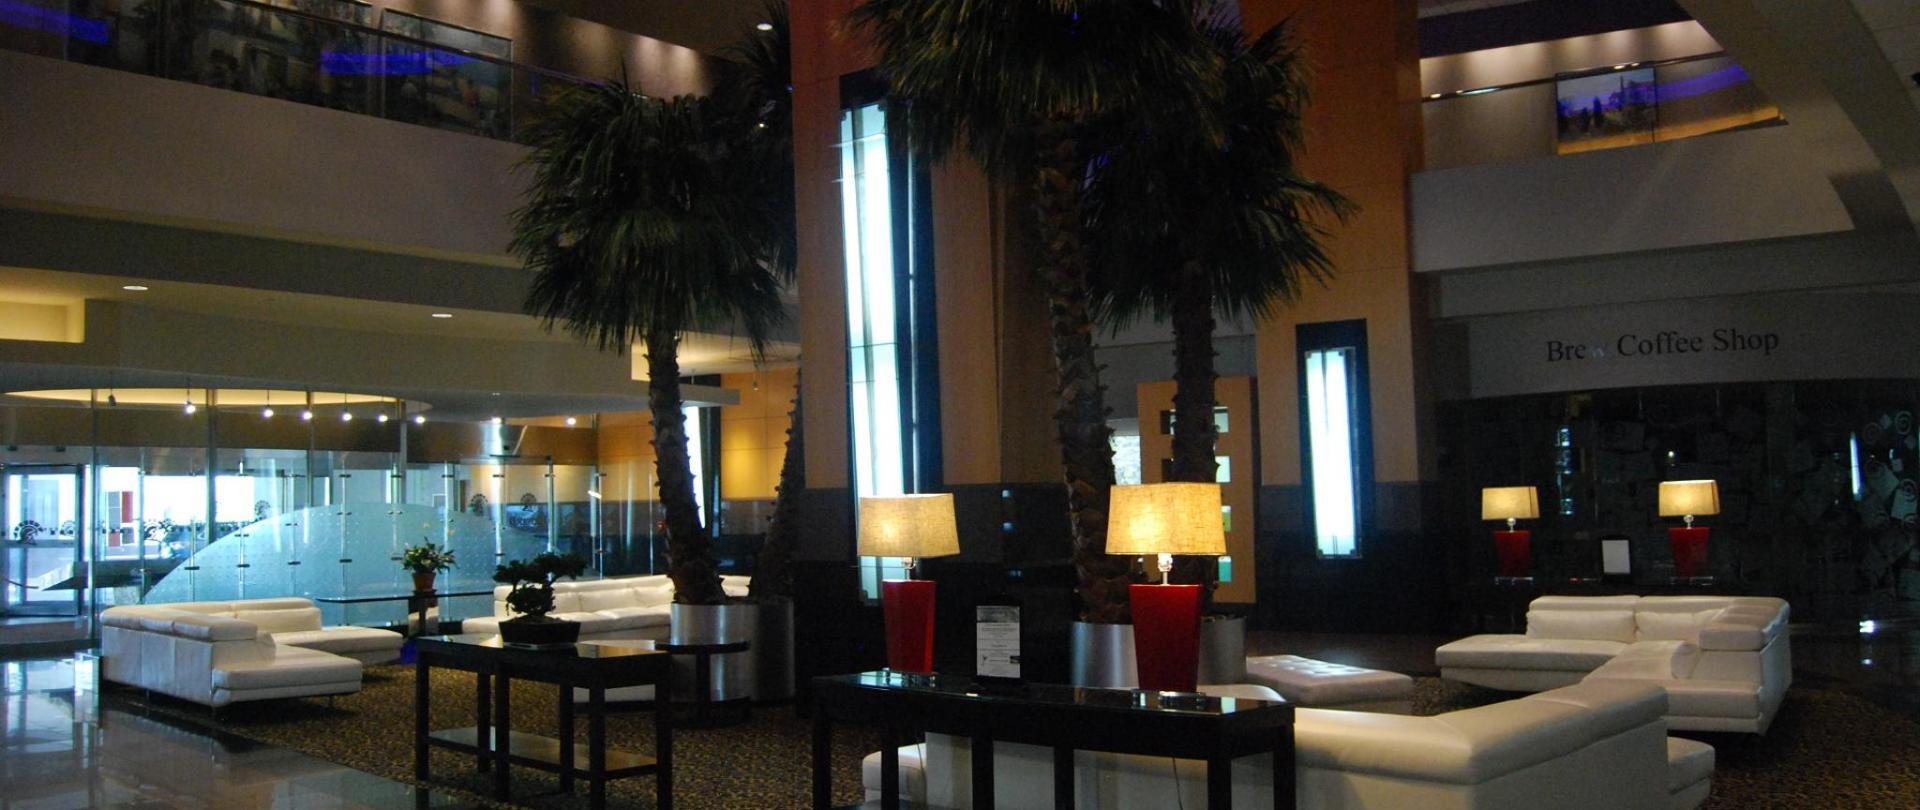 nic lobby pic.jpg